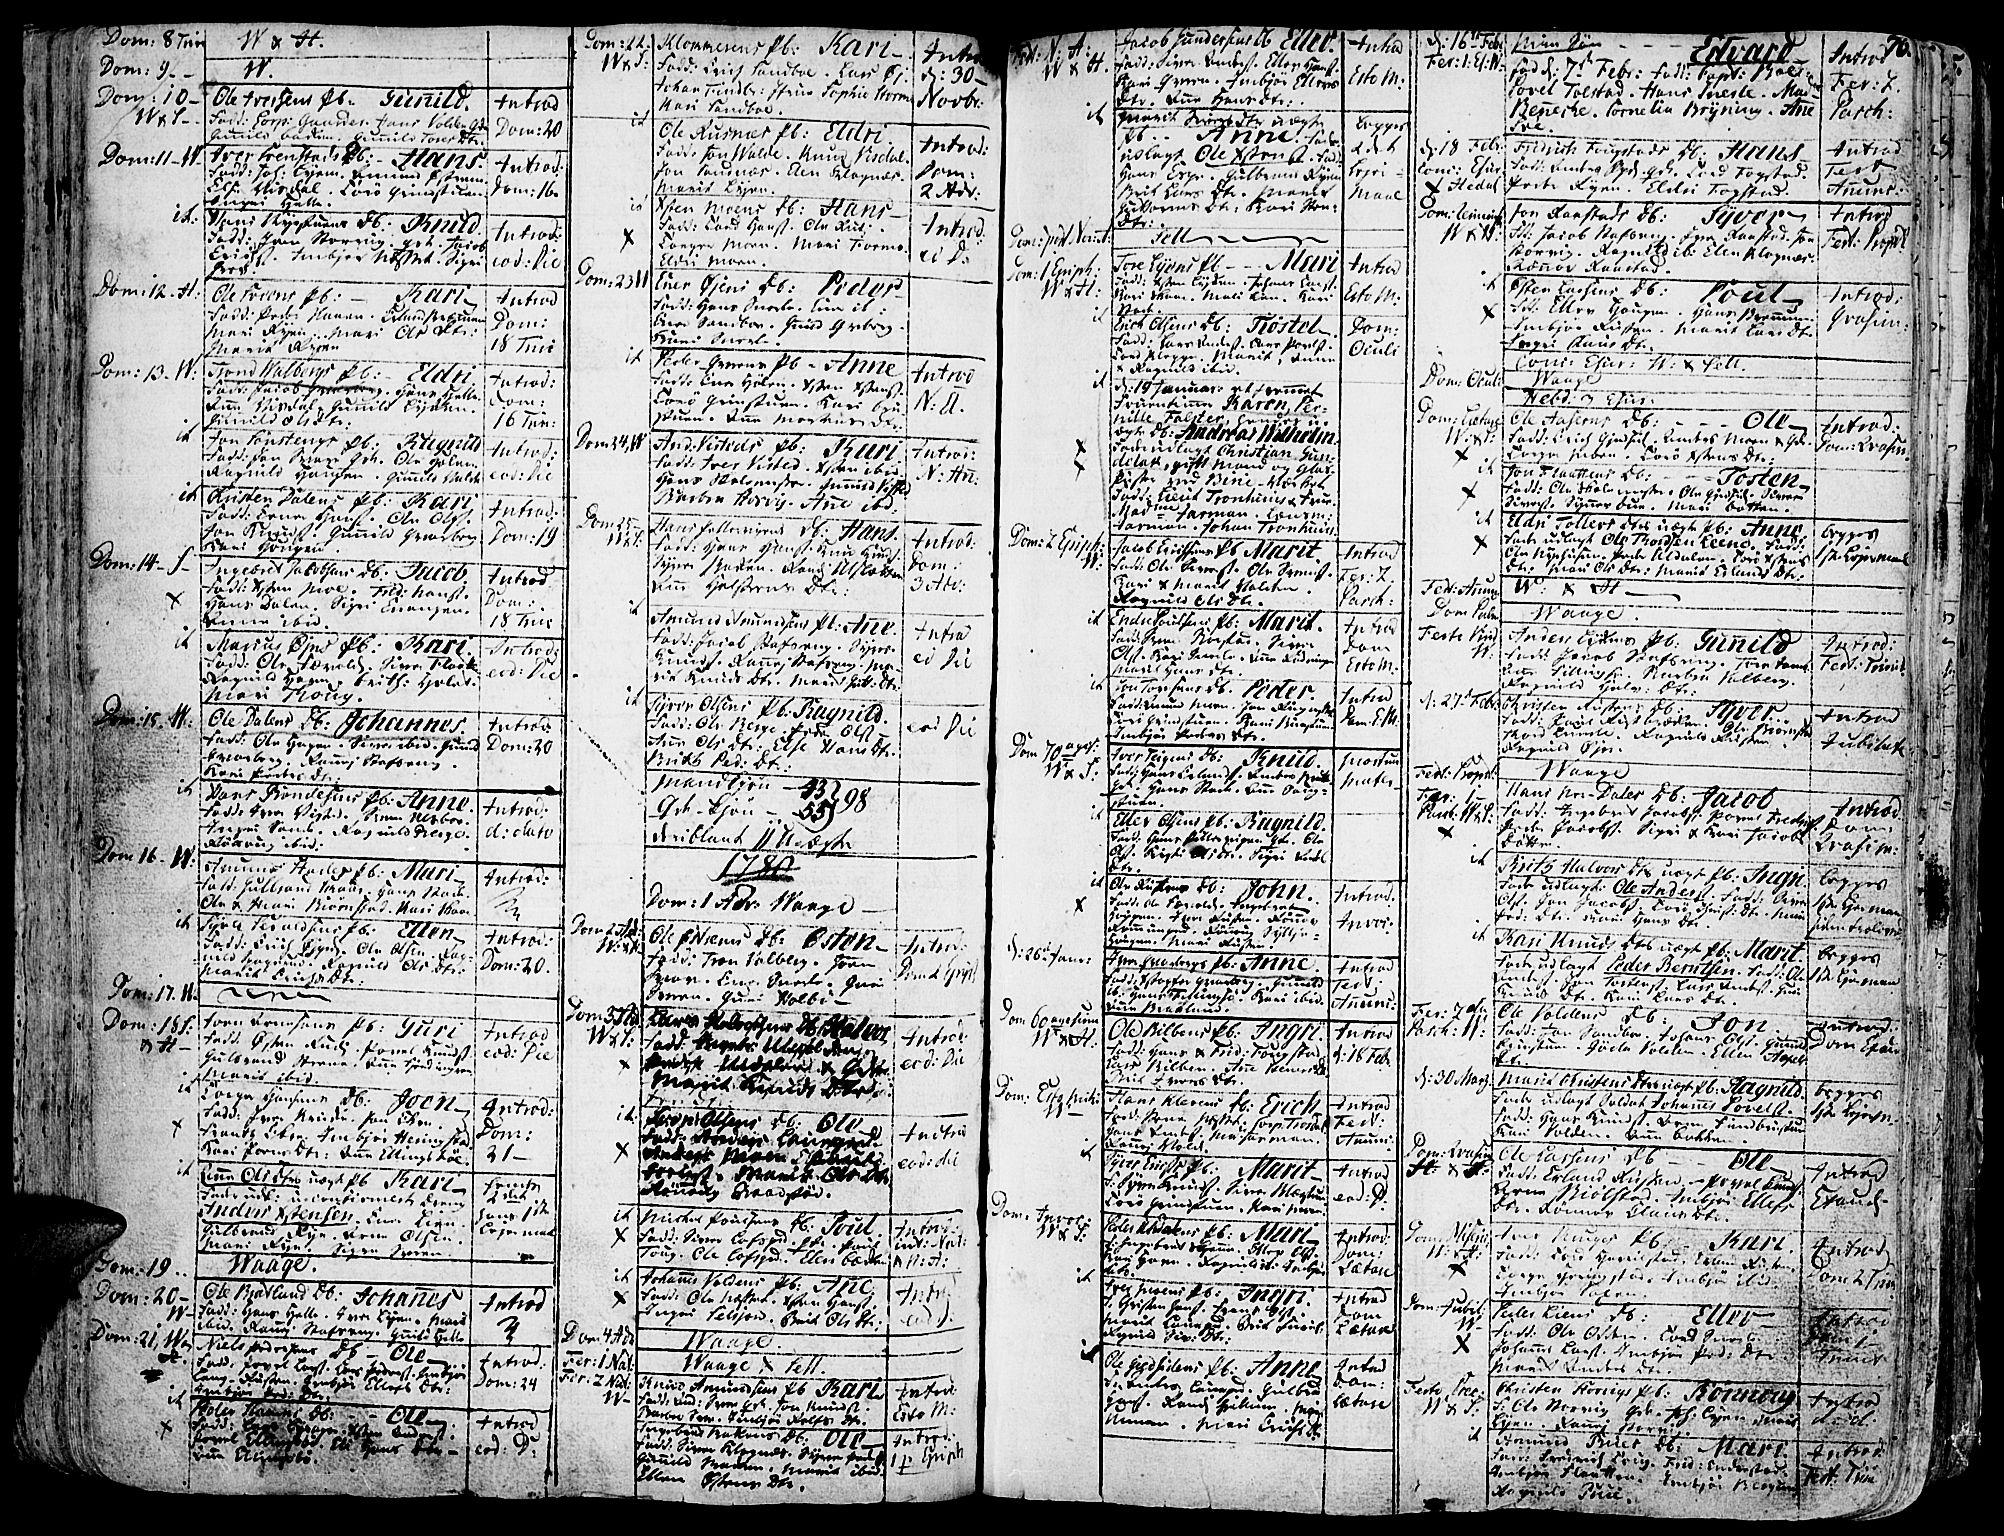 SAH, Vågå prestekontor, Ministerialbok nr. 1, 1739-1810, s. 76